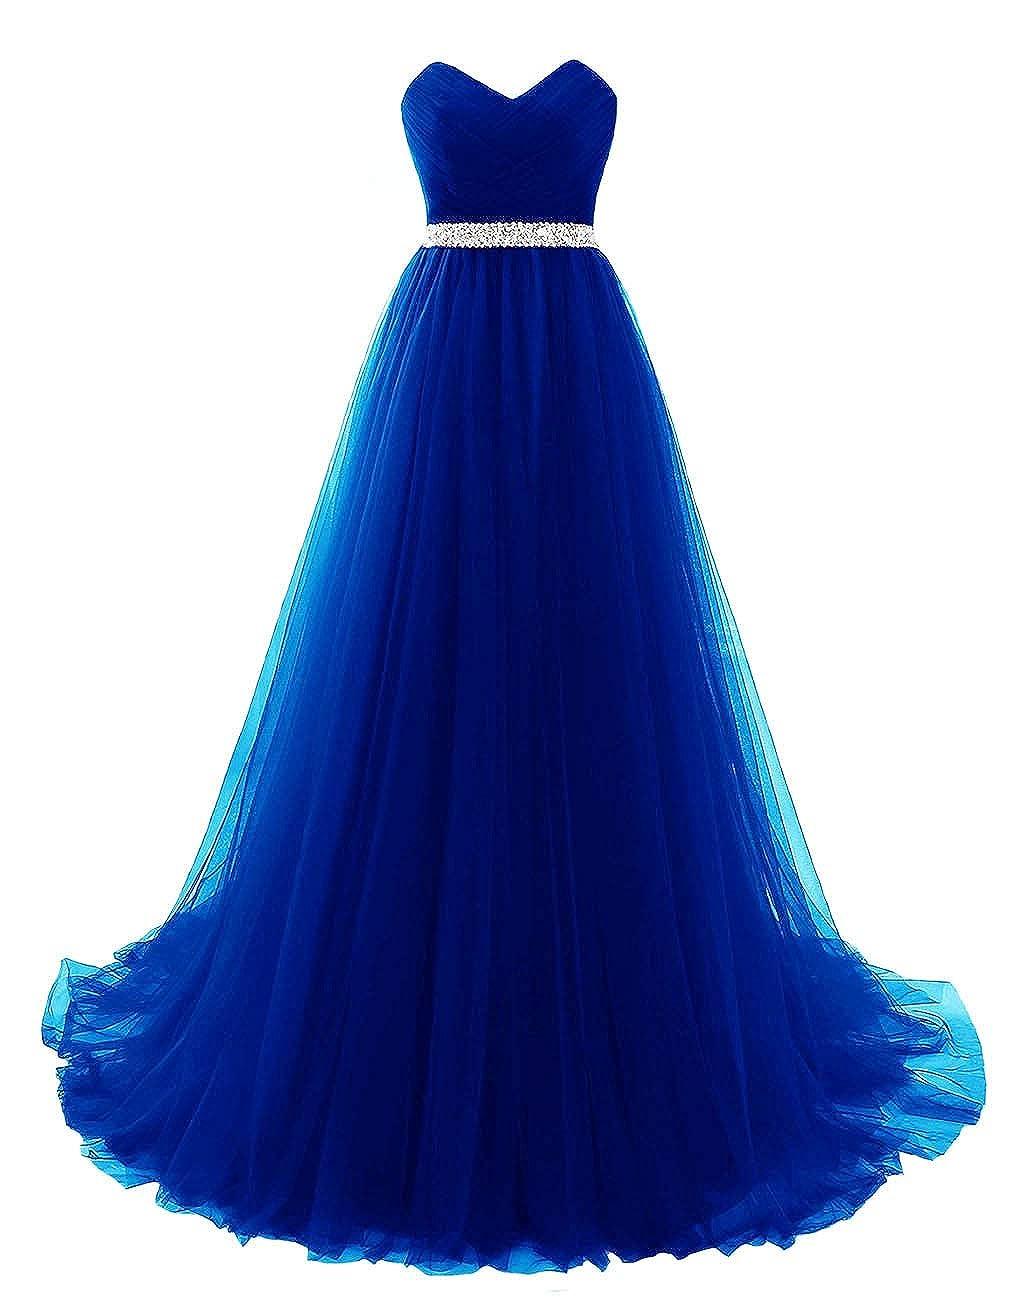 bluee Vantexi Women's Sweetheart Beaded Belt Tulle Evening Prom Dresses